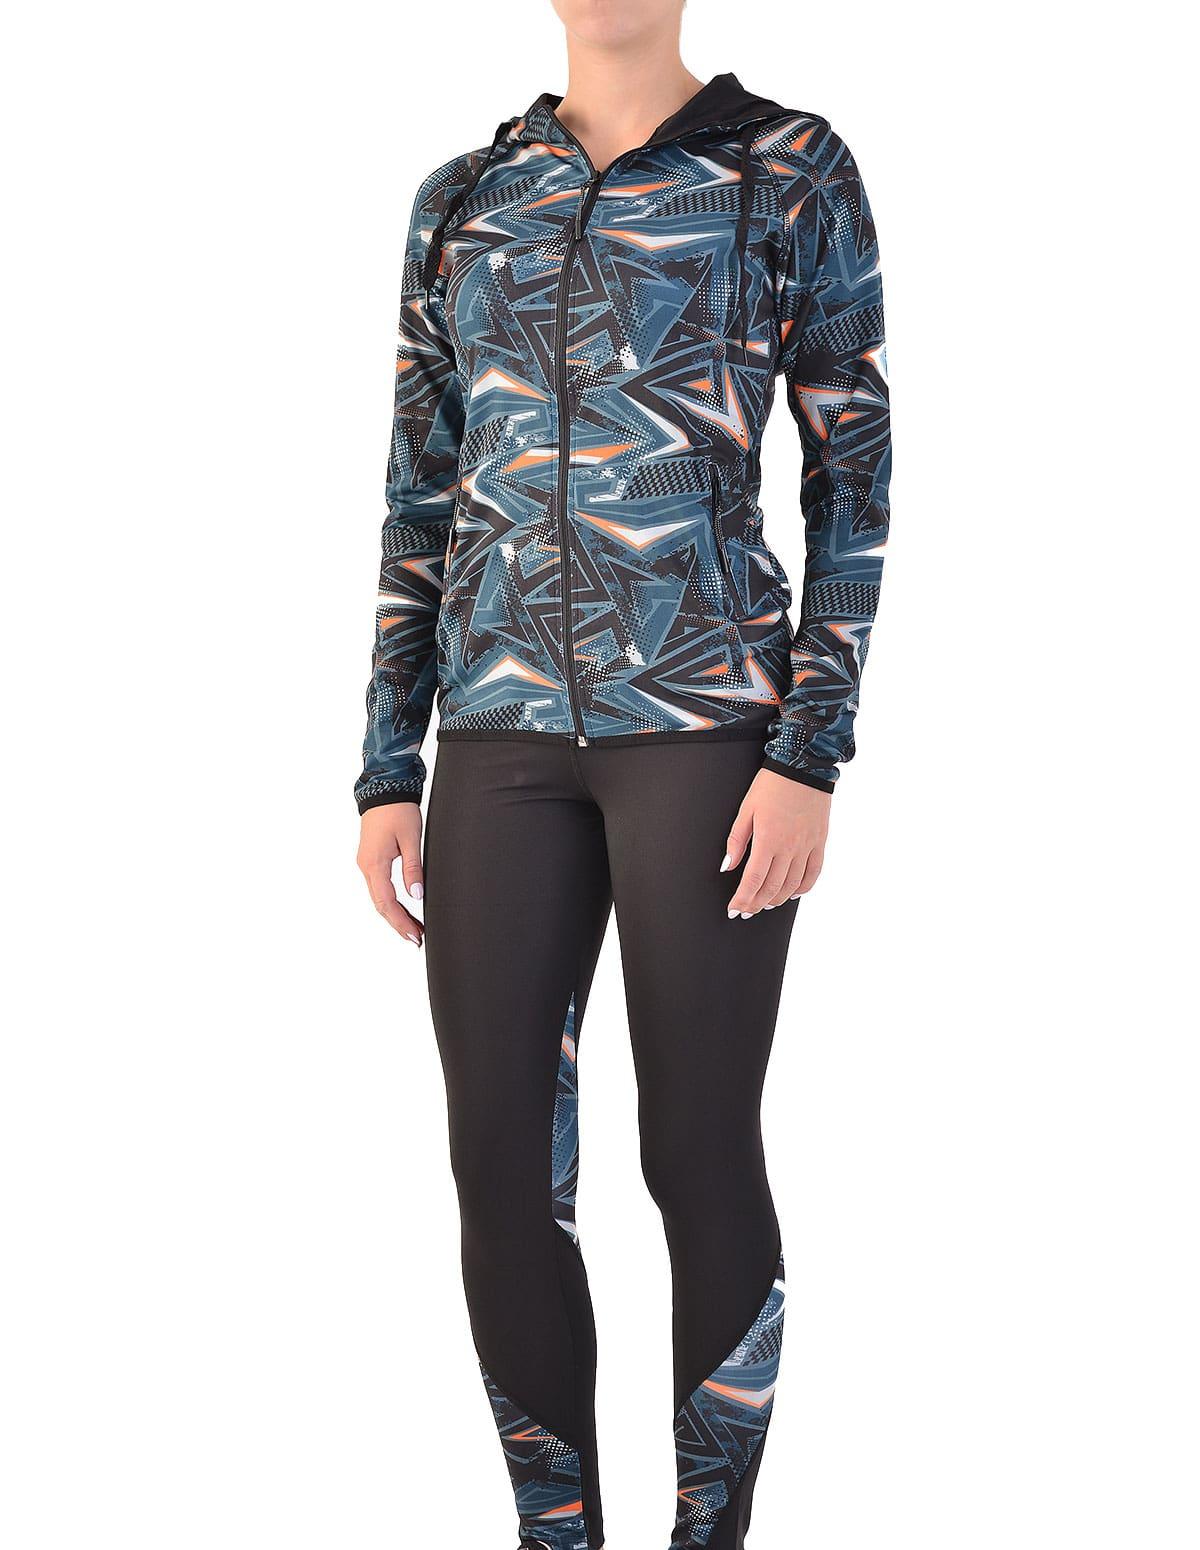 132b64cf45f1 Γυναικείο σετ ζακέτα και κολάν με σχέδιο σε χρώμα μαύρο και πετρόλ -  vactive.gr